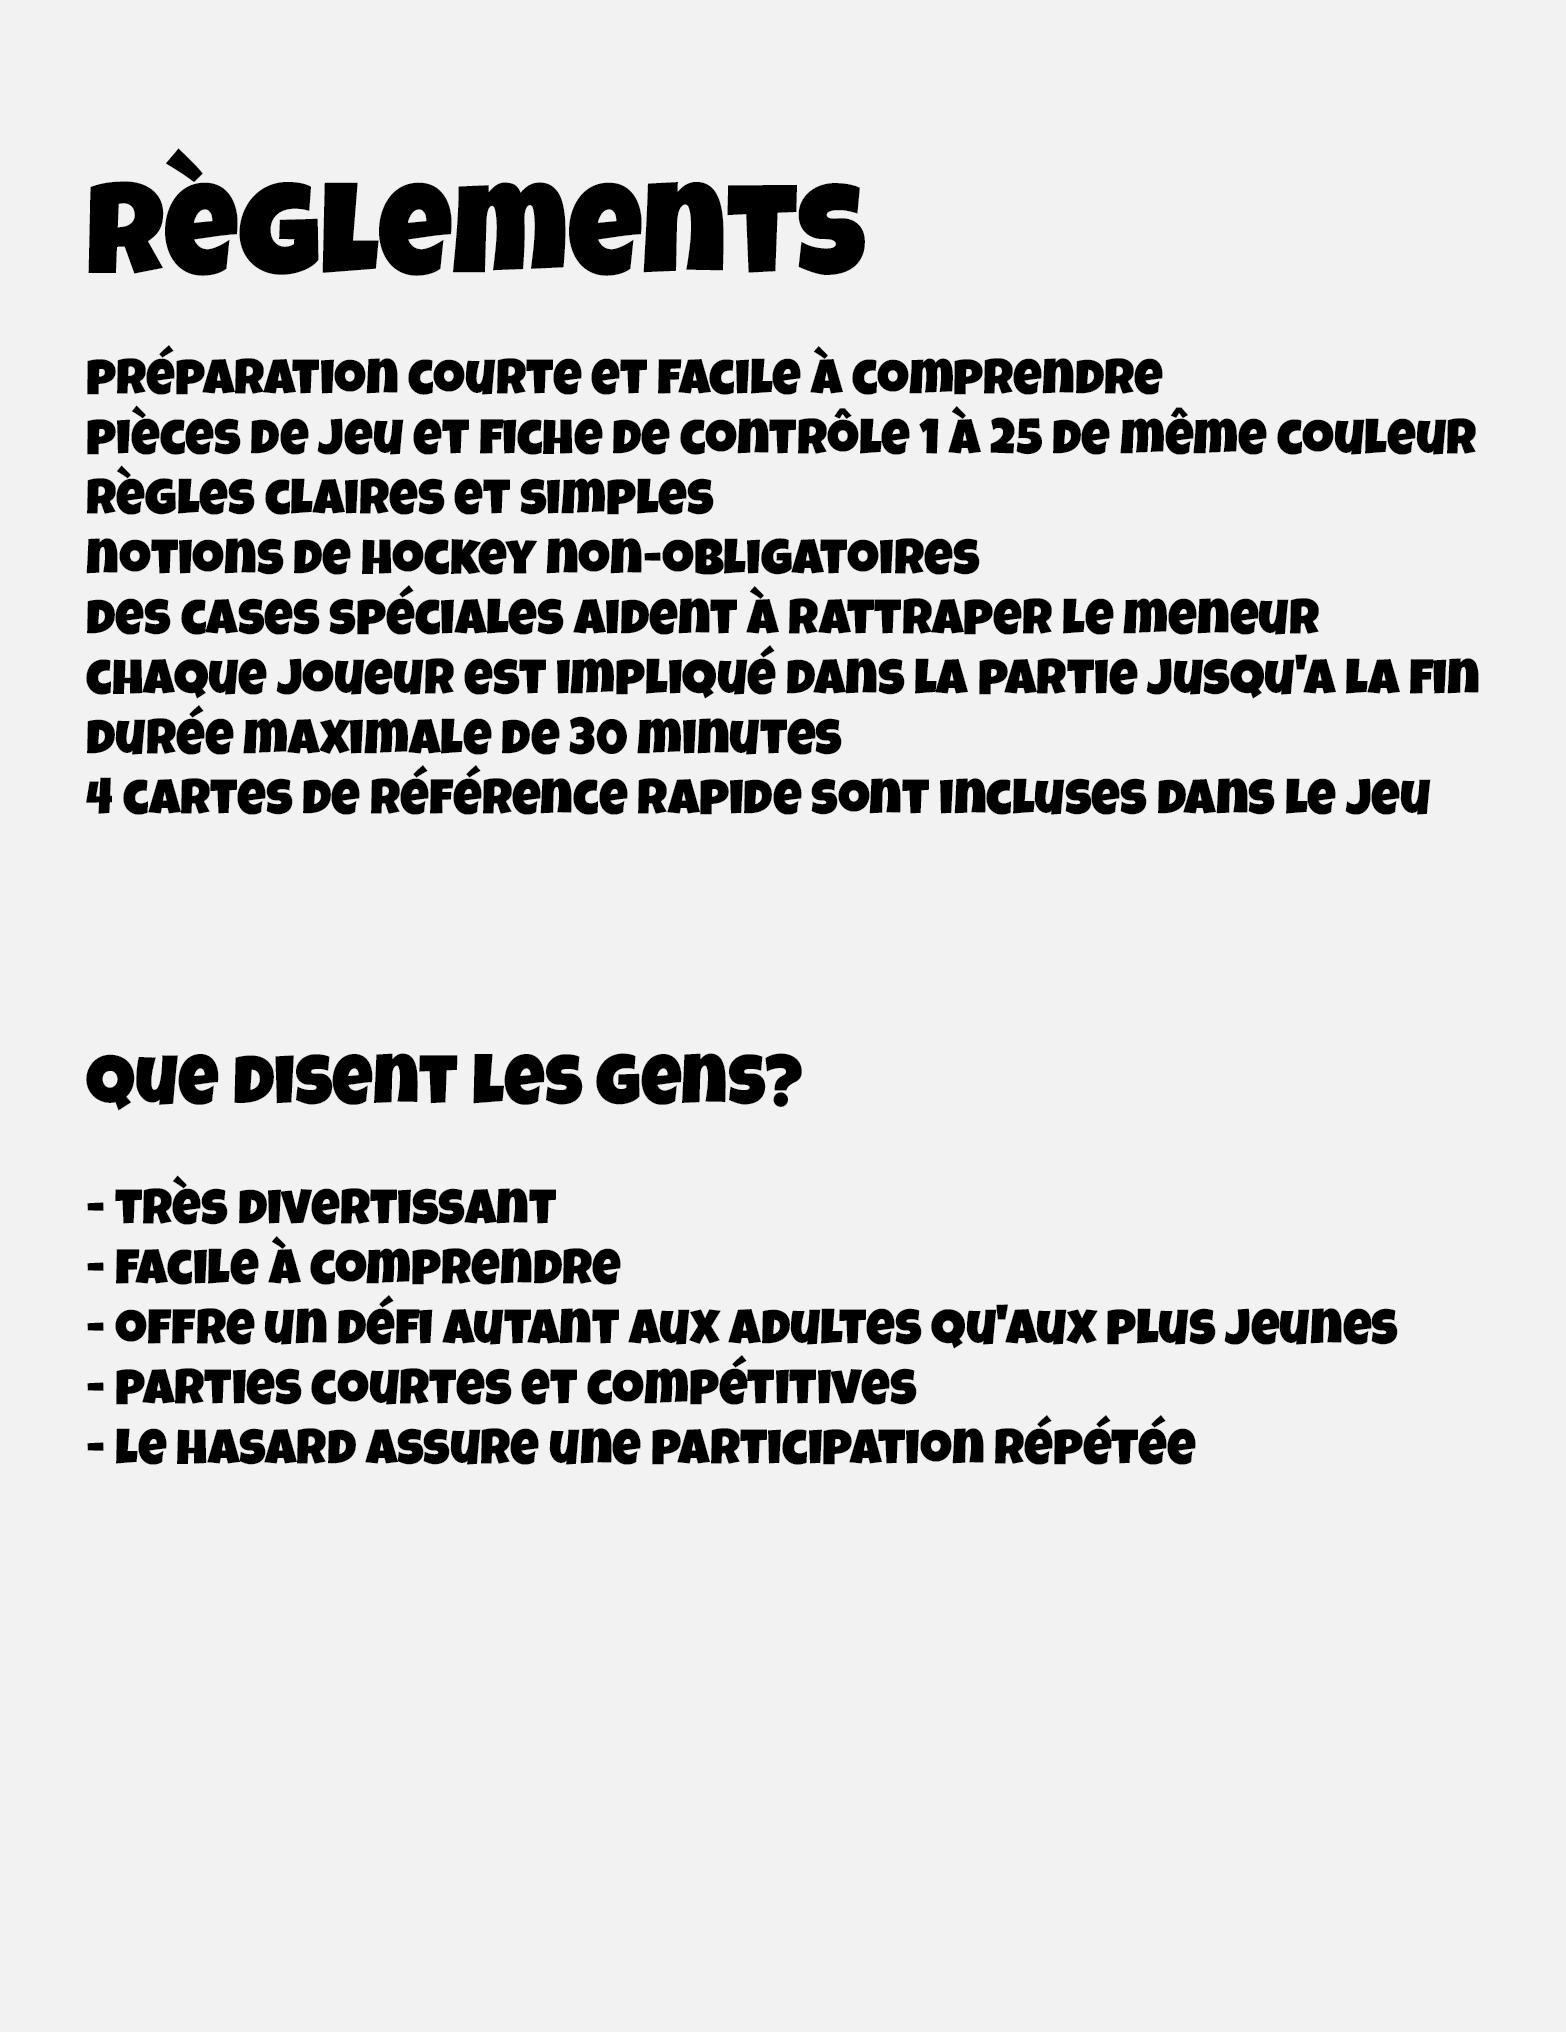 Règlements fr.png